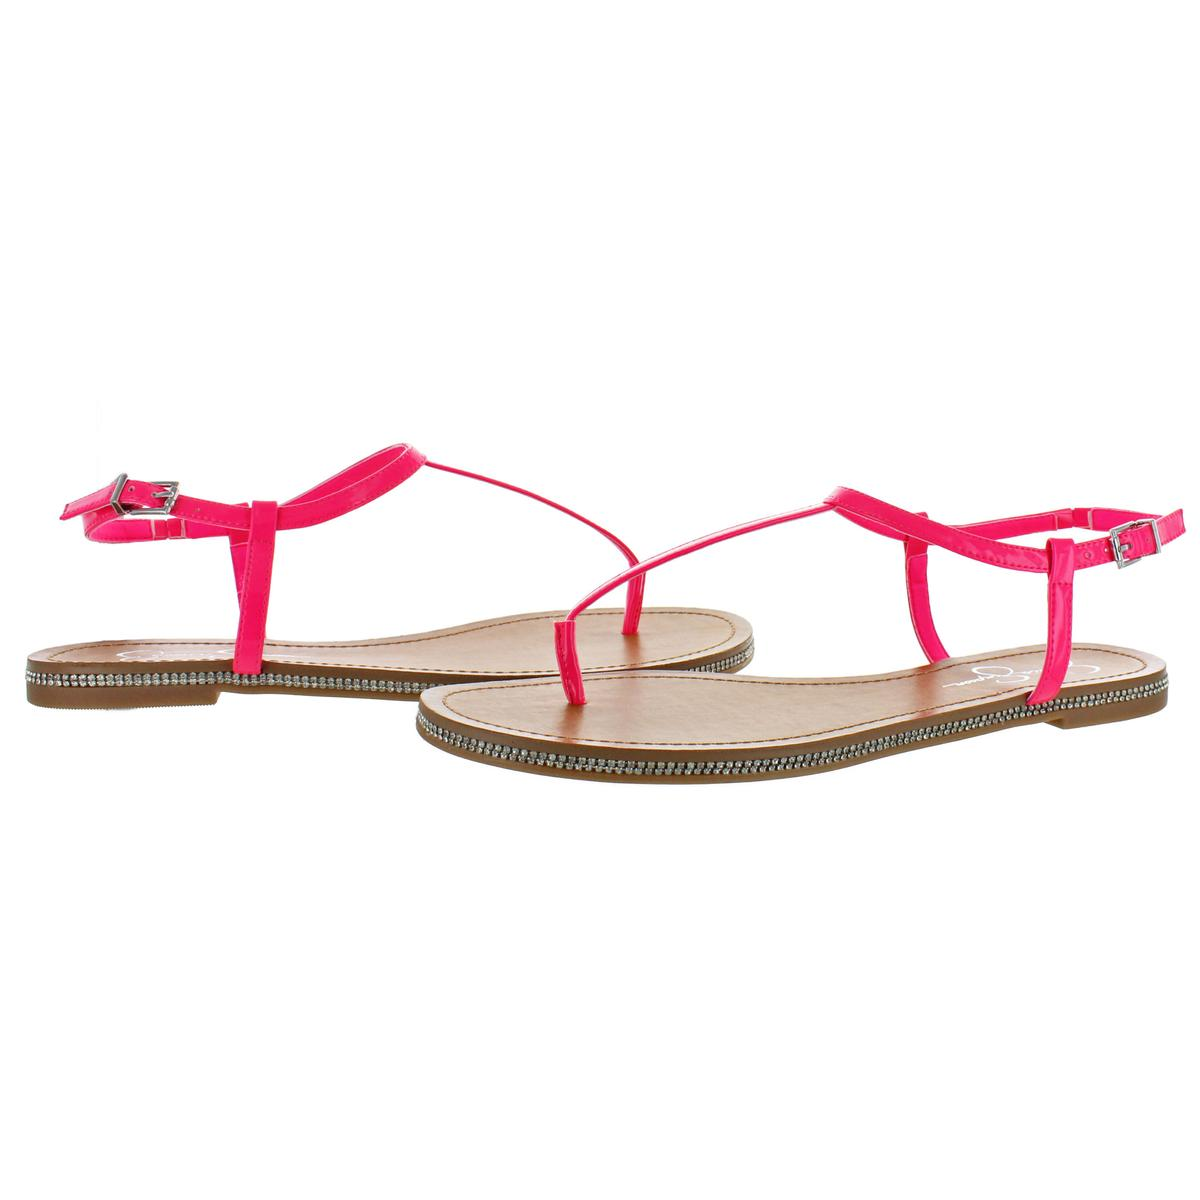 Jessica-Simpson-Femme-Brimah-Casual-String-Spartiates-Chaussures-BHFO-1194 miniature 10